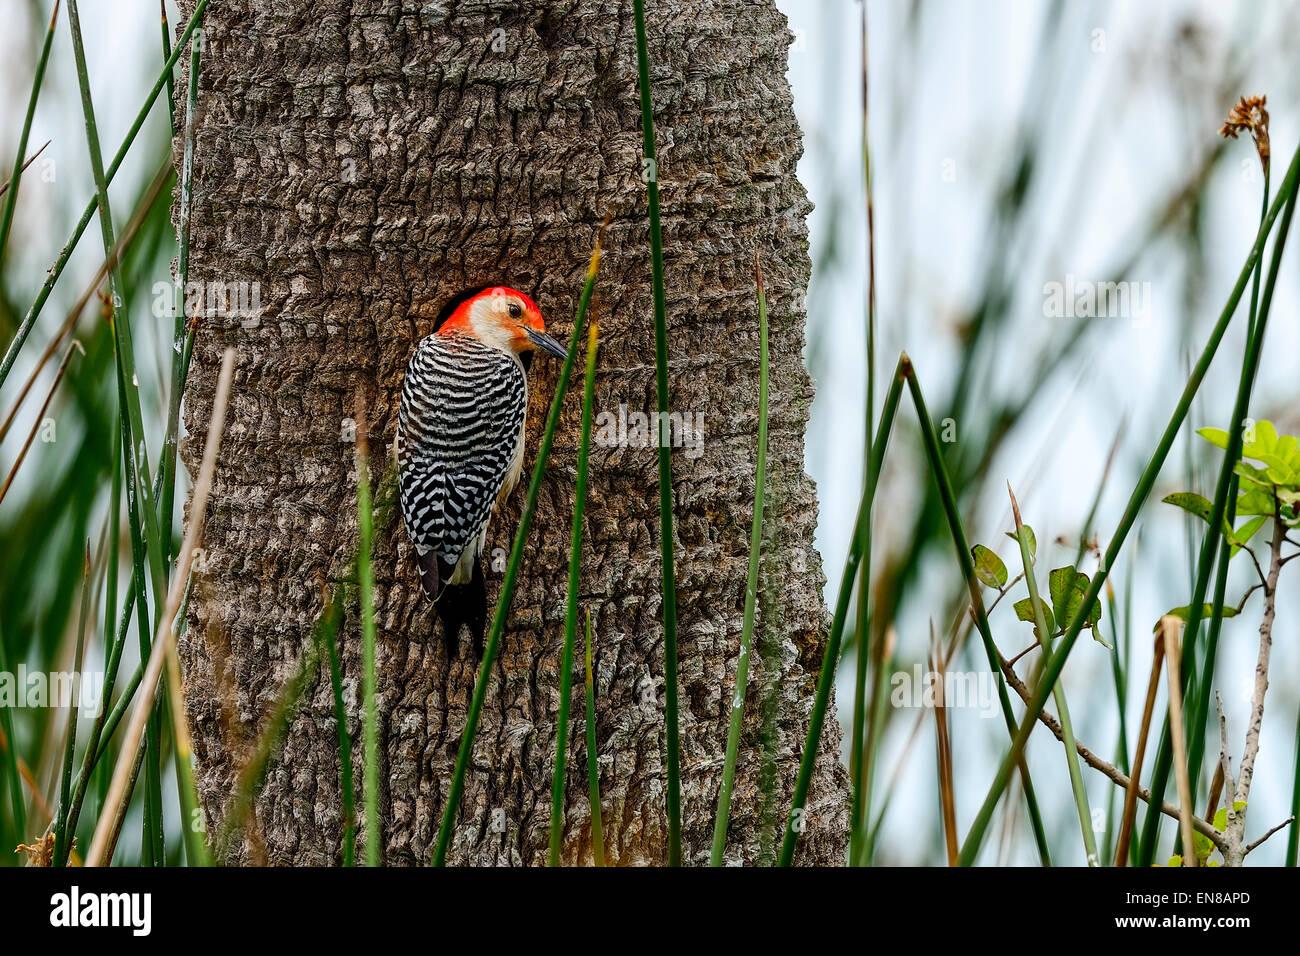 red-bellied woodpecker, viera wetlands - Stock Image